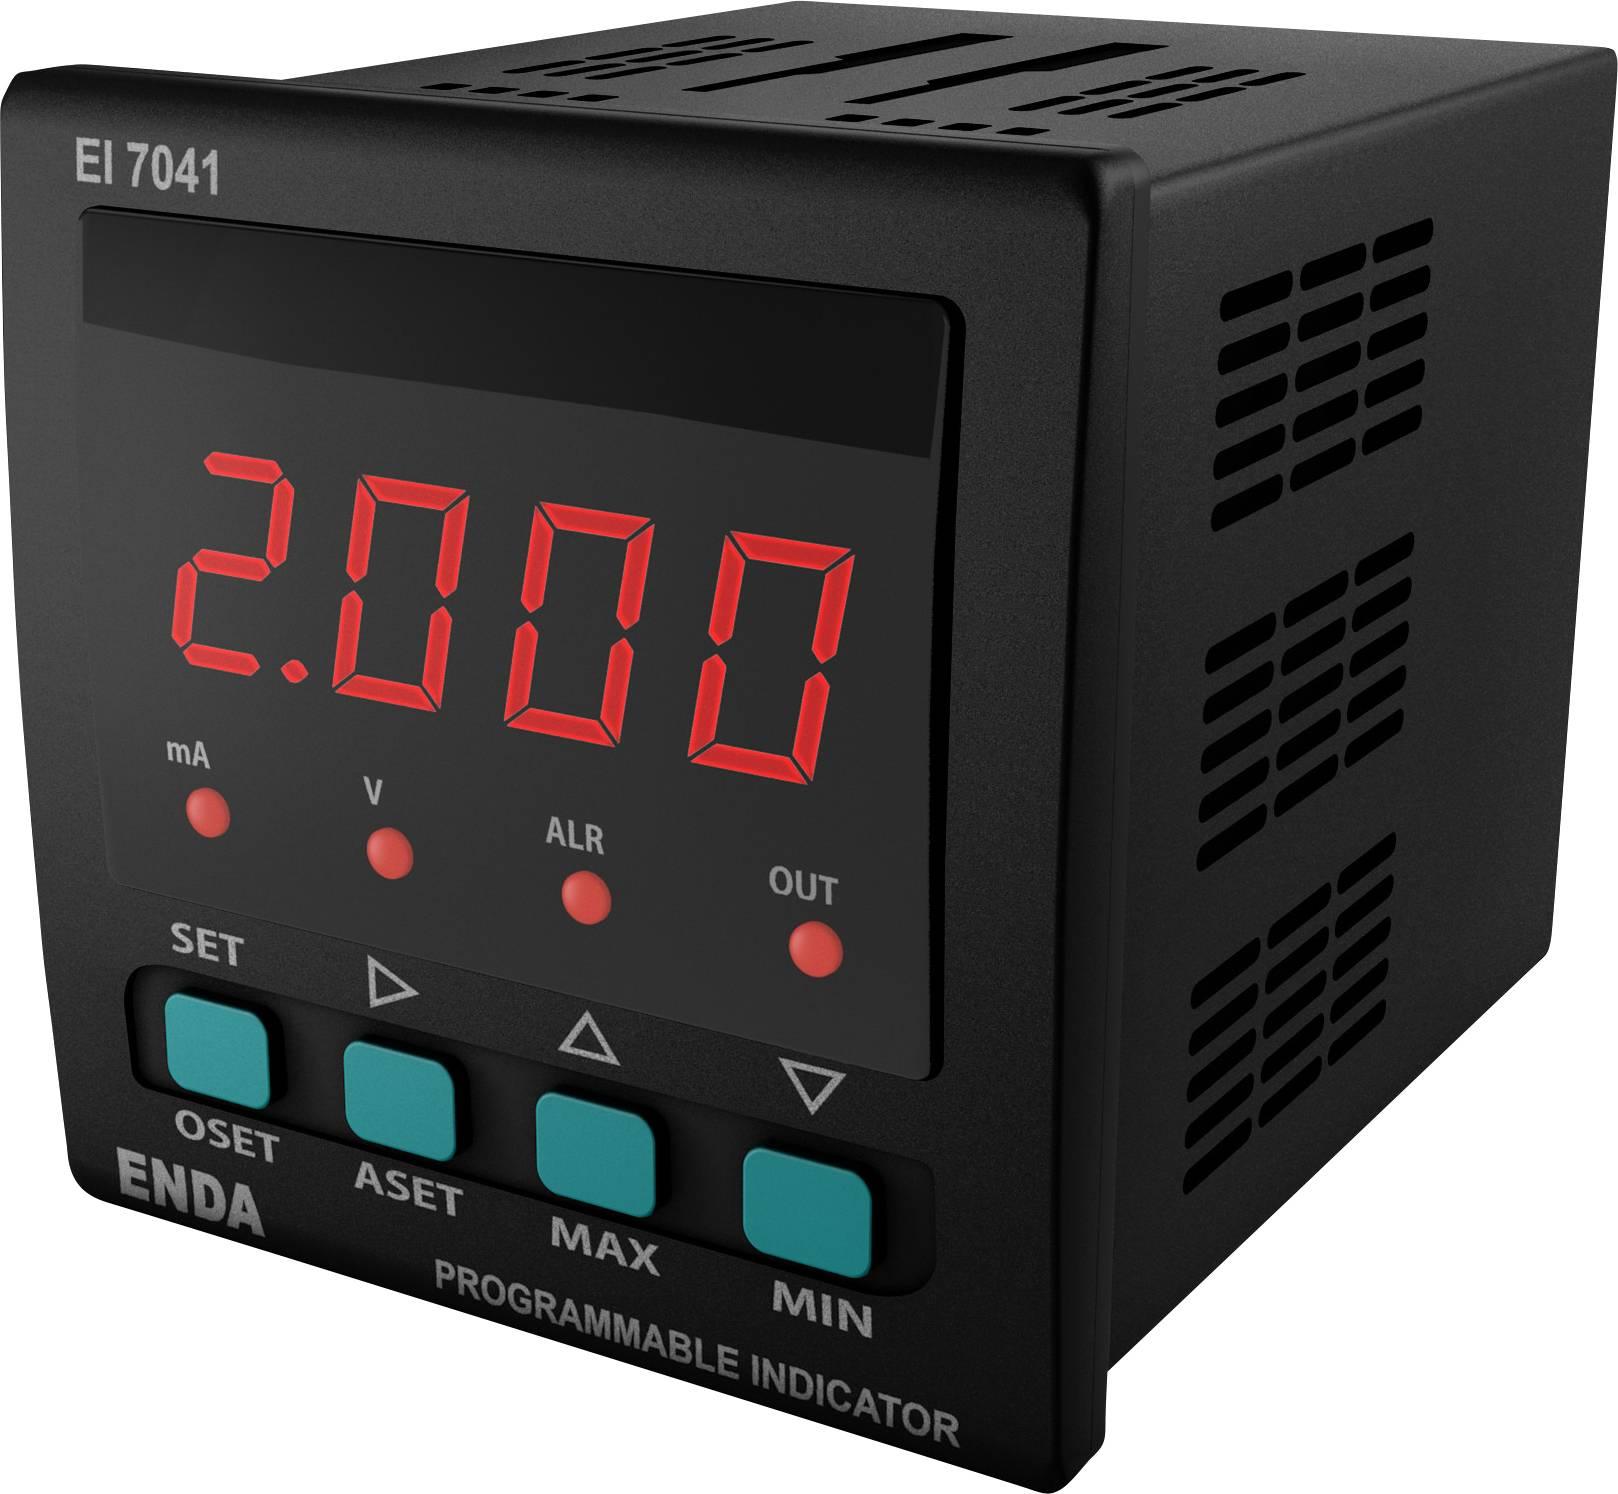 Univerzálny LED displej Suran Enda EI7412-230-AS12